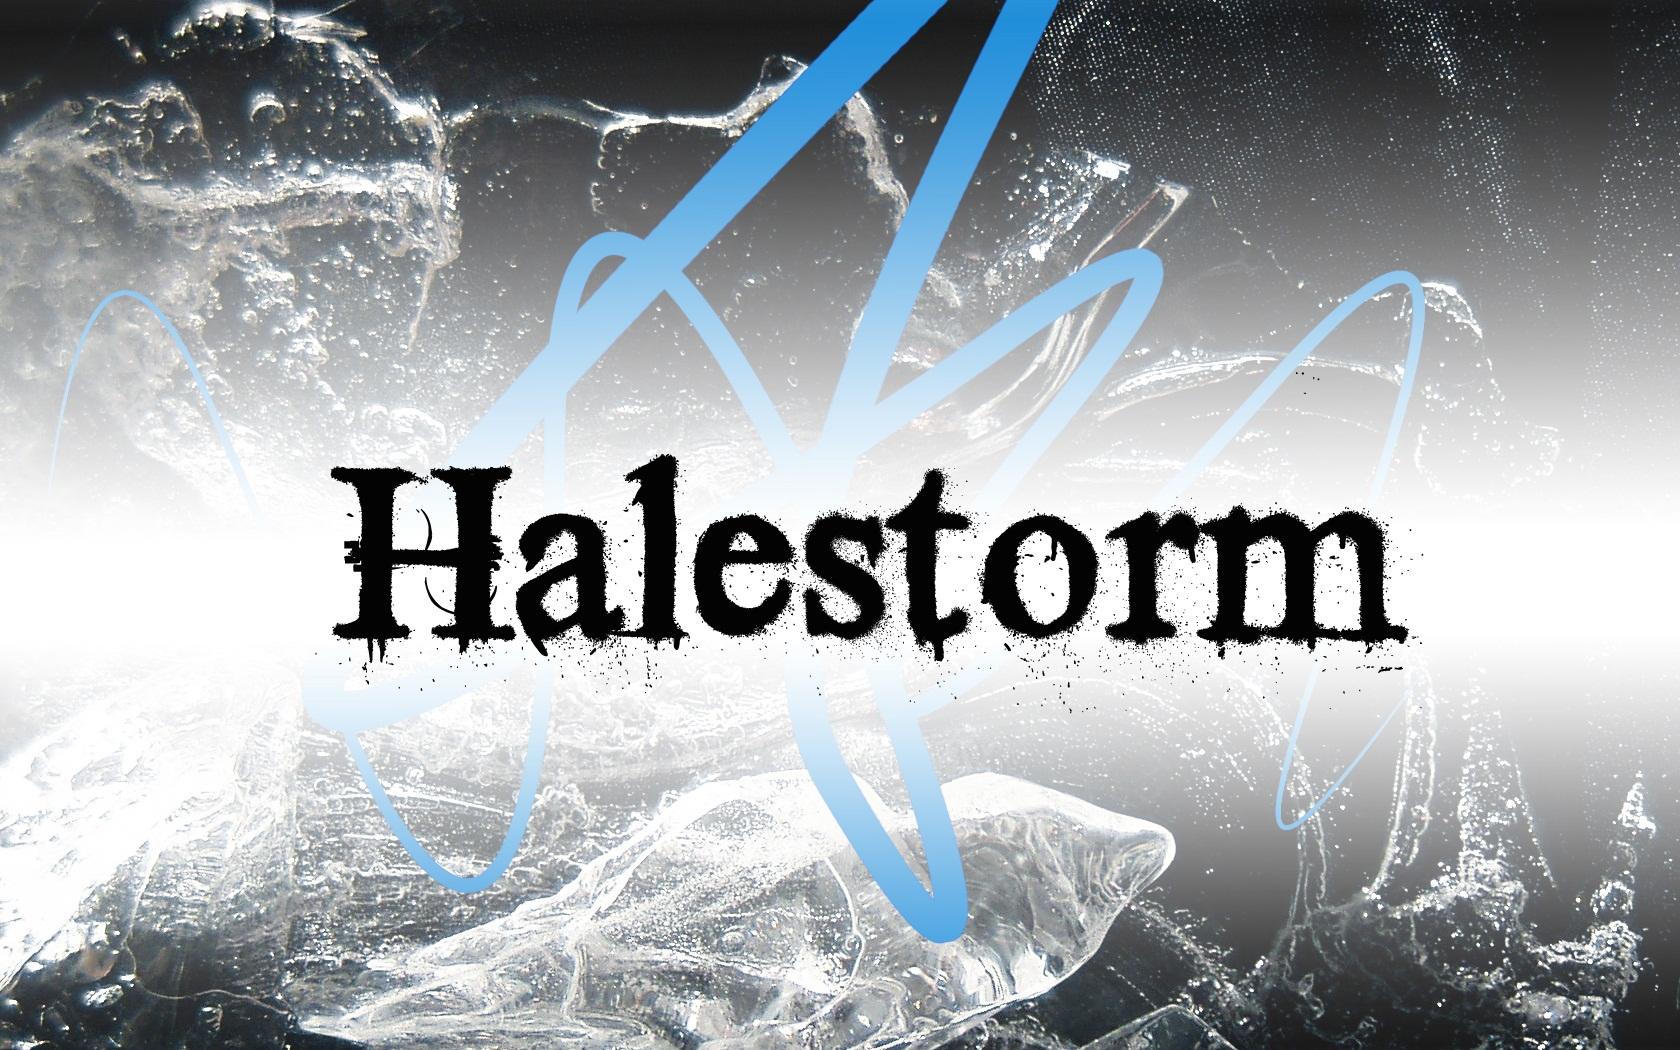 Halestorm 2 by SaptaRishi 1680x1050